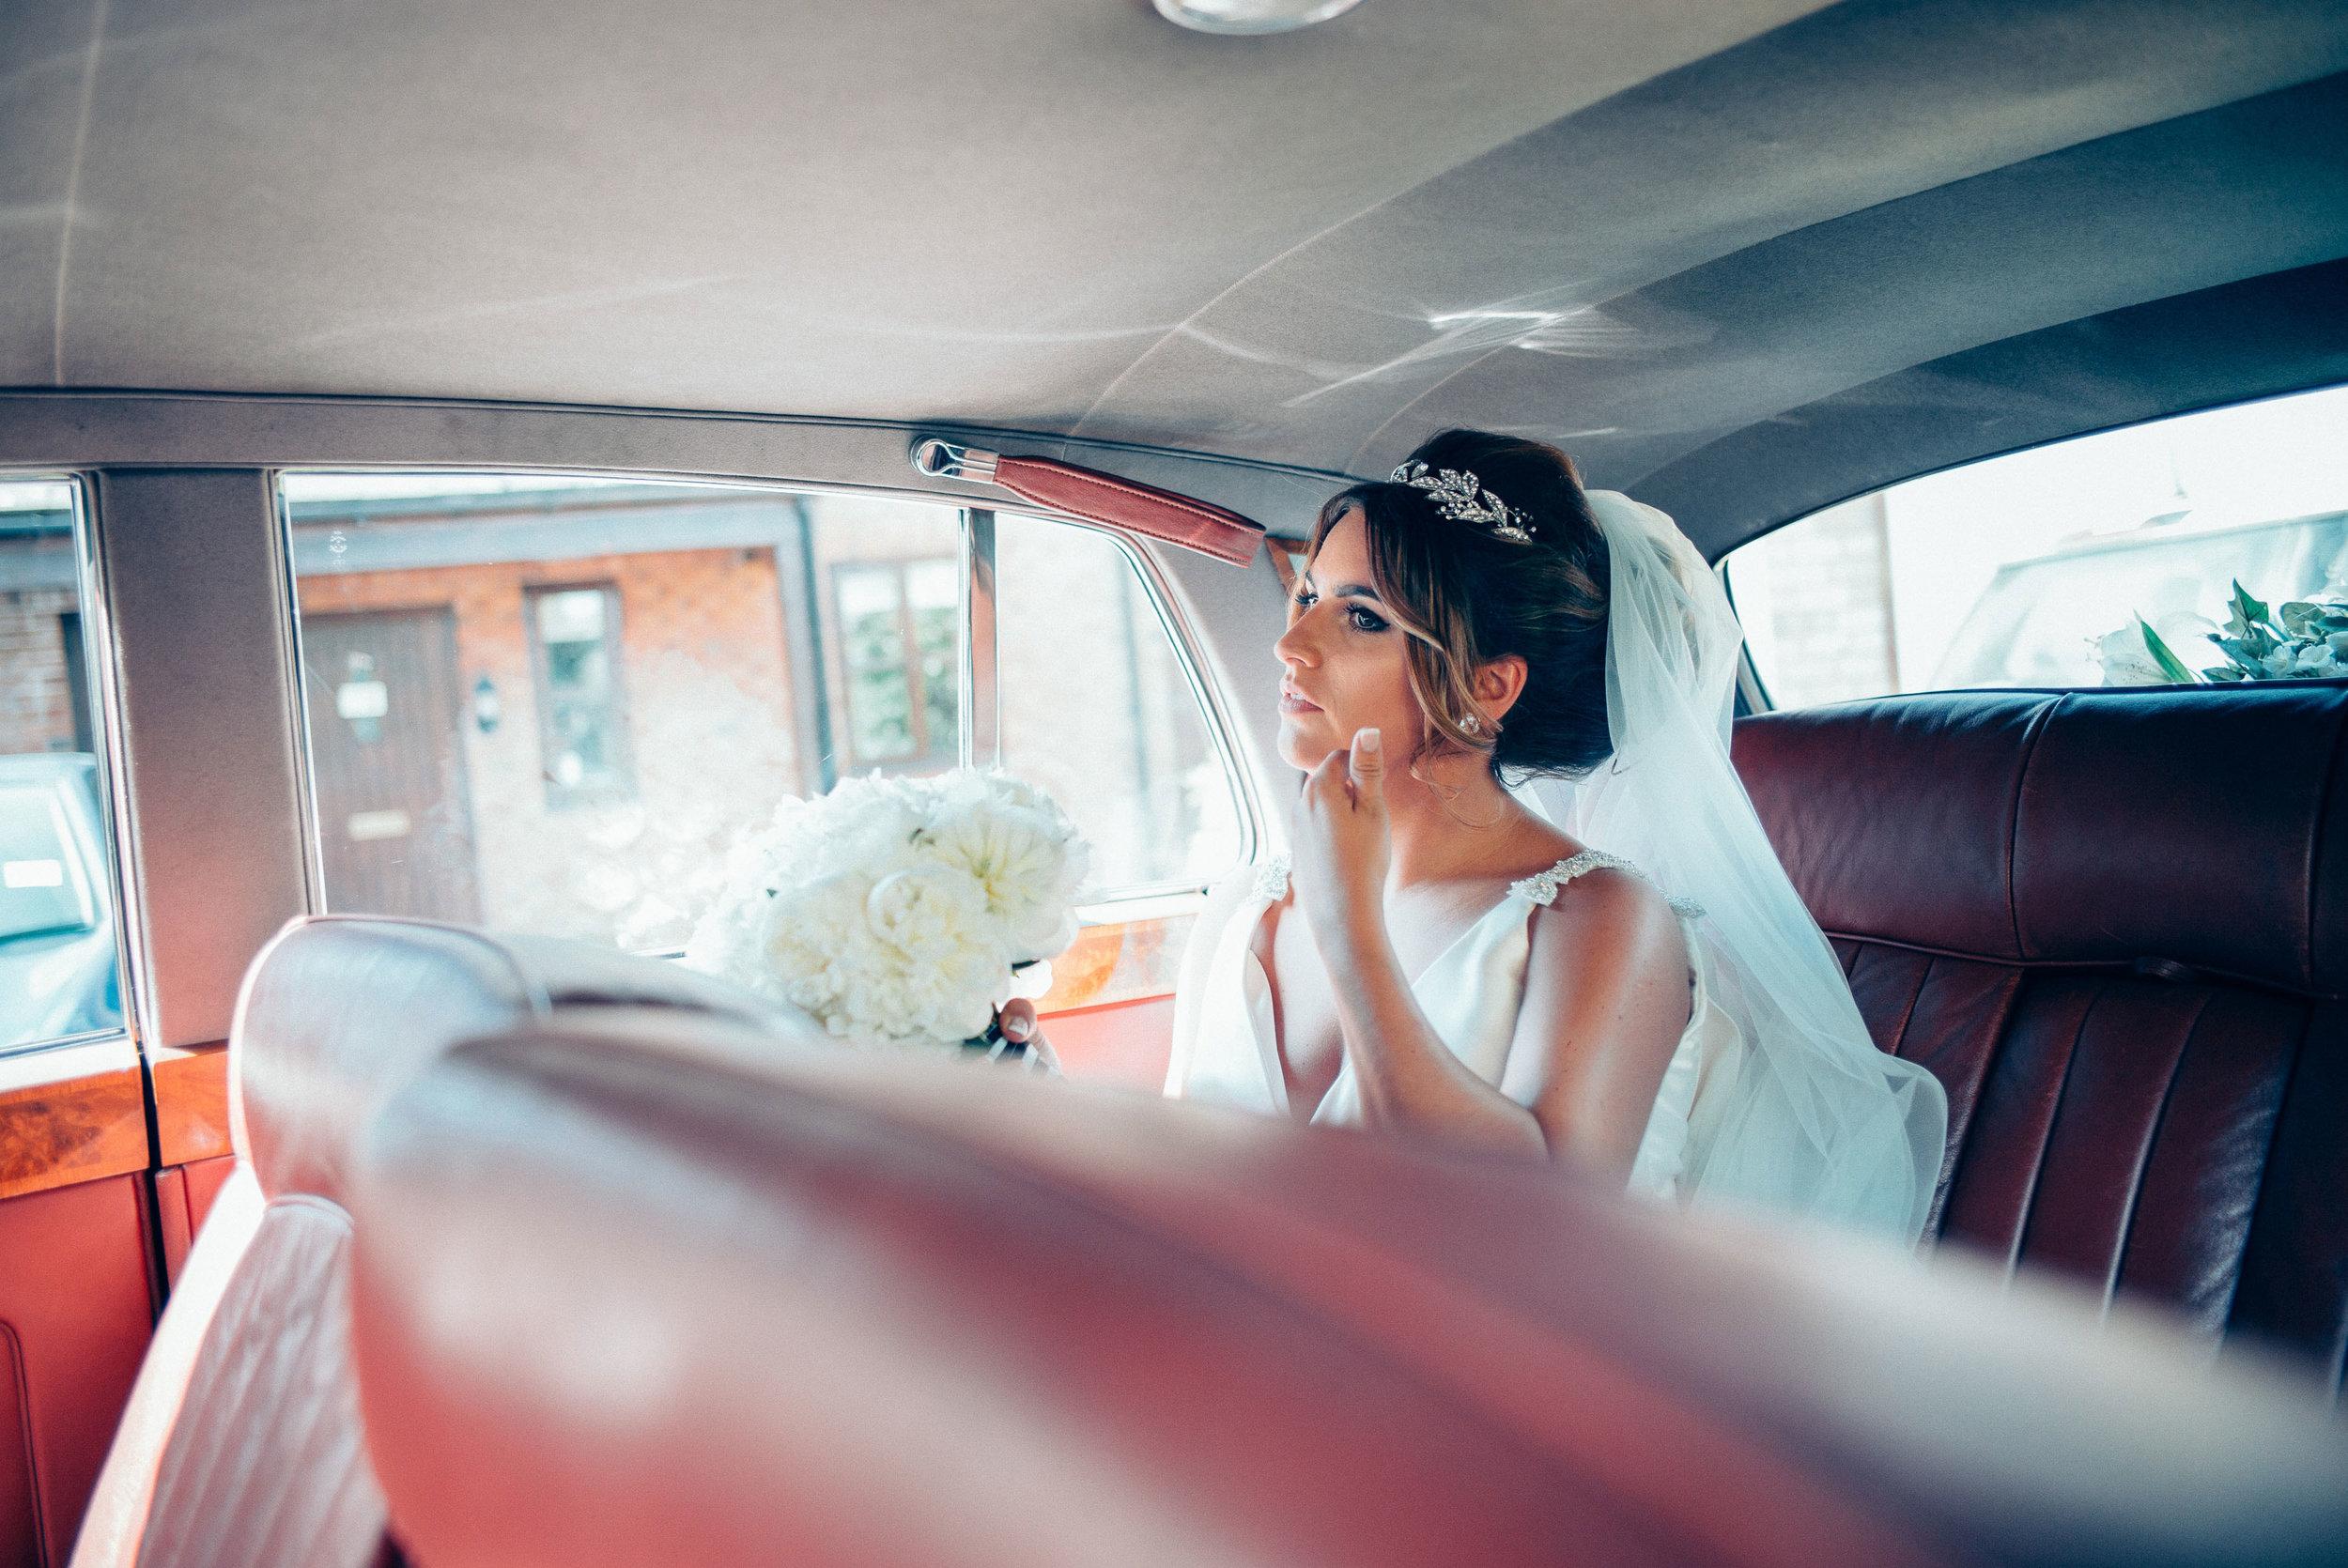 Joshua_Fray_Wedding_Photography-3_qu3jbr.jpg